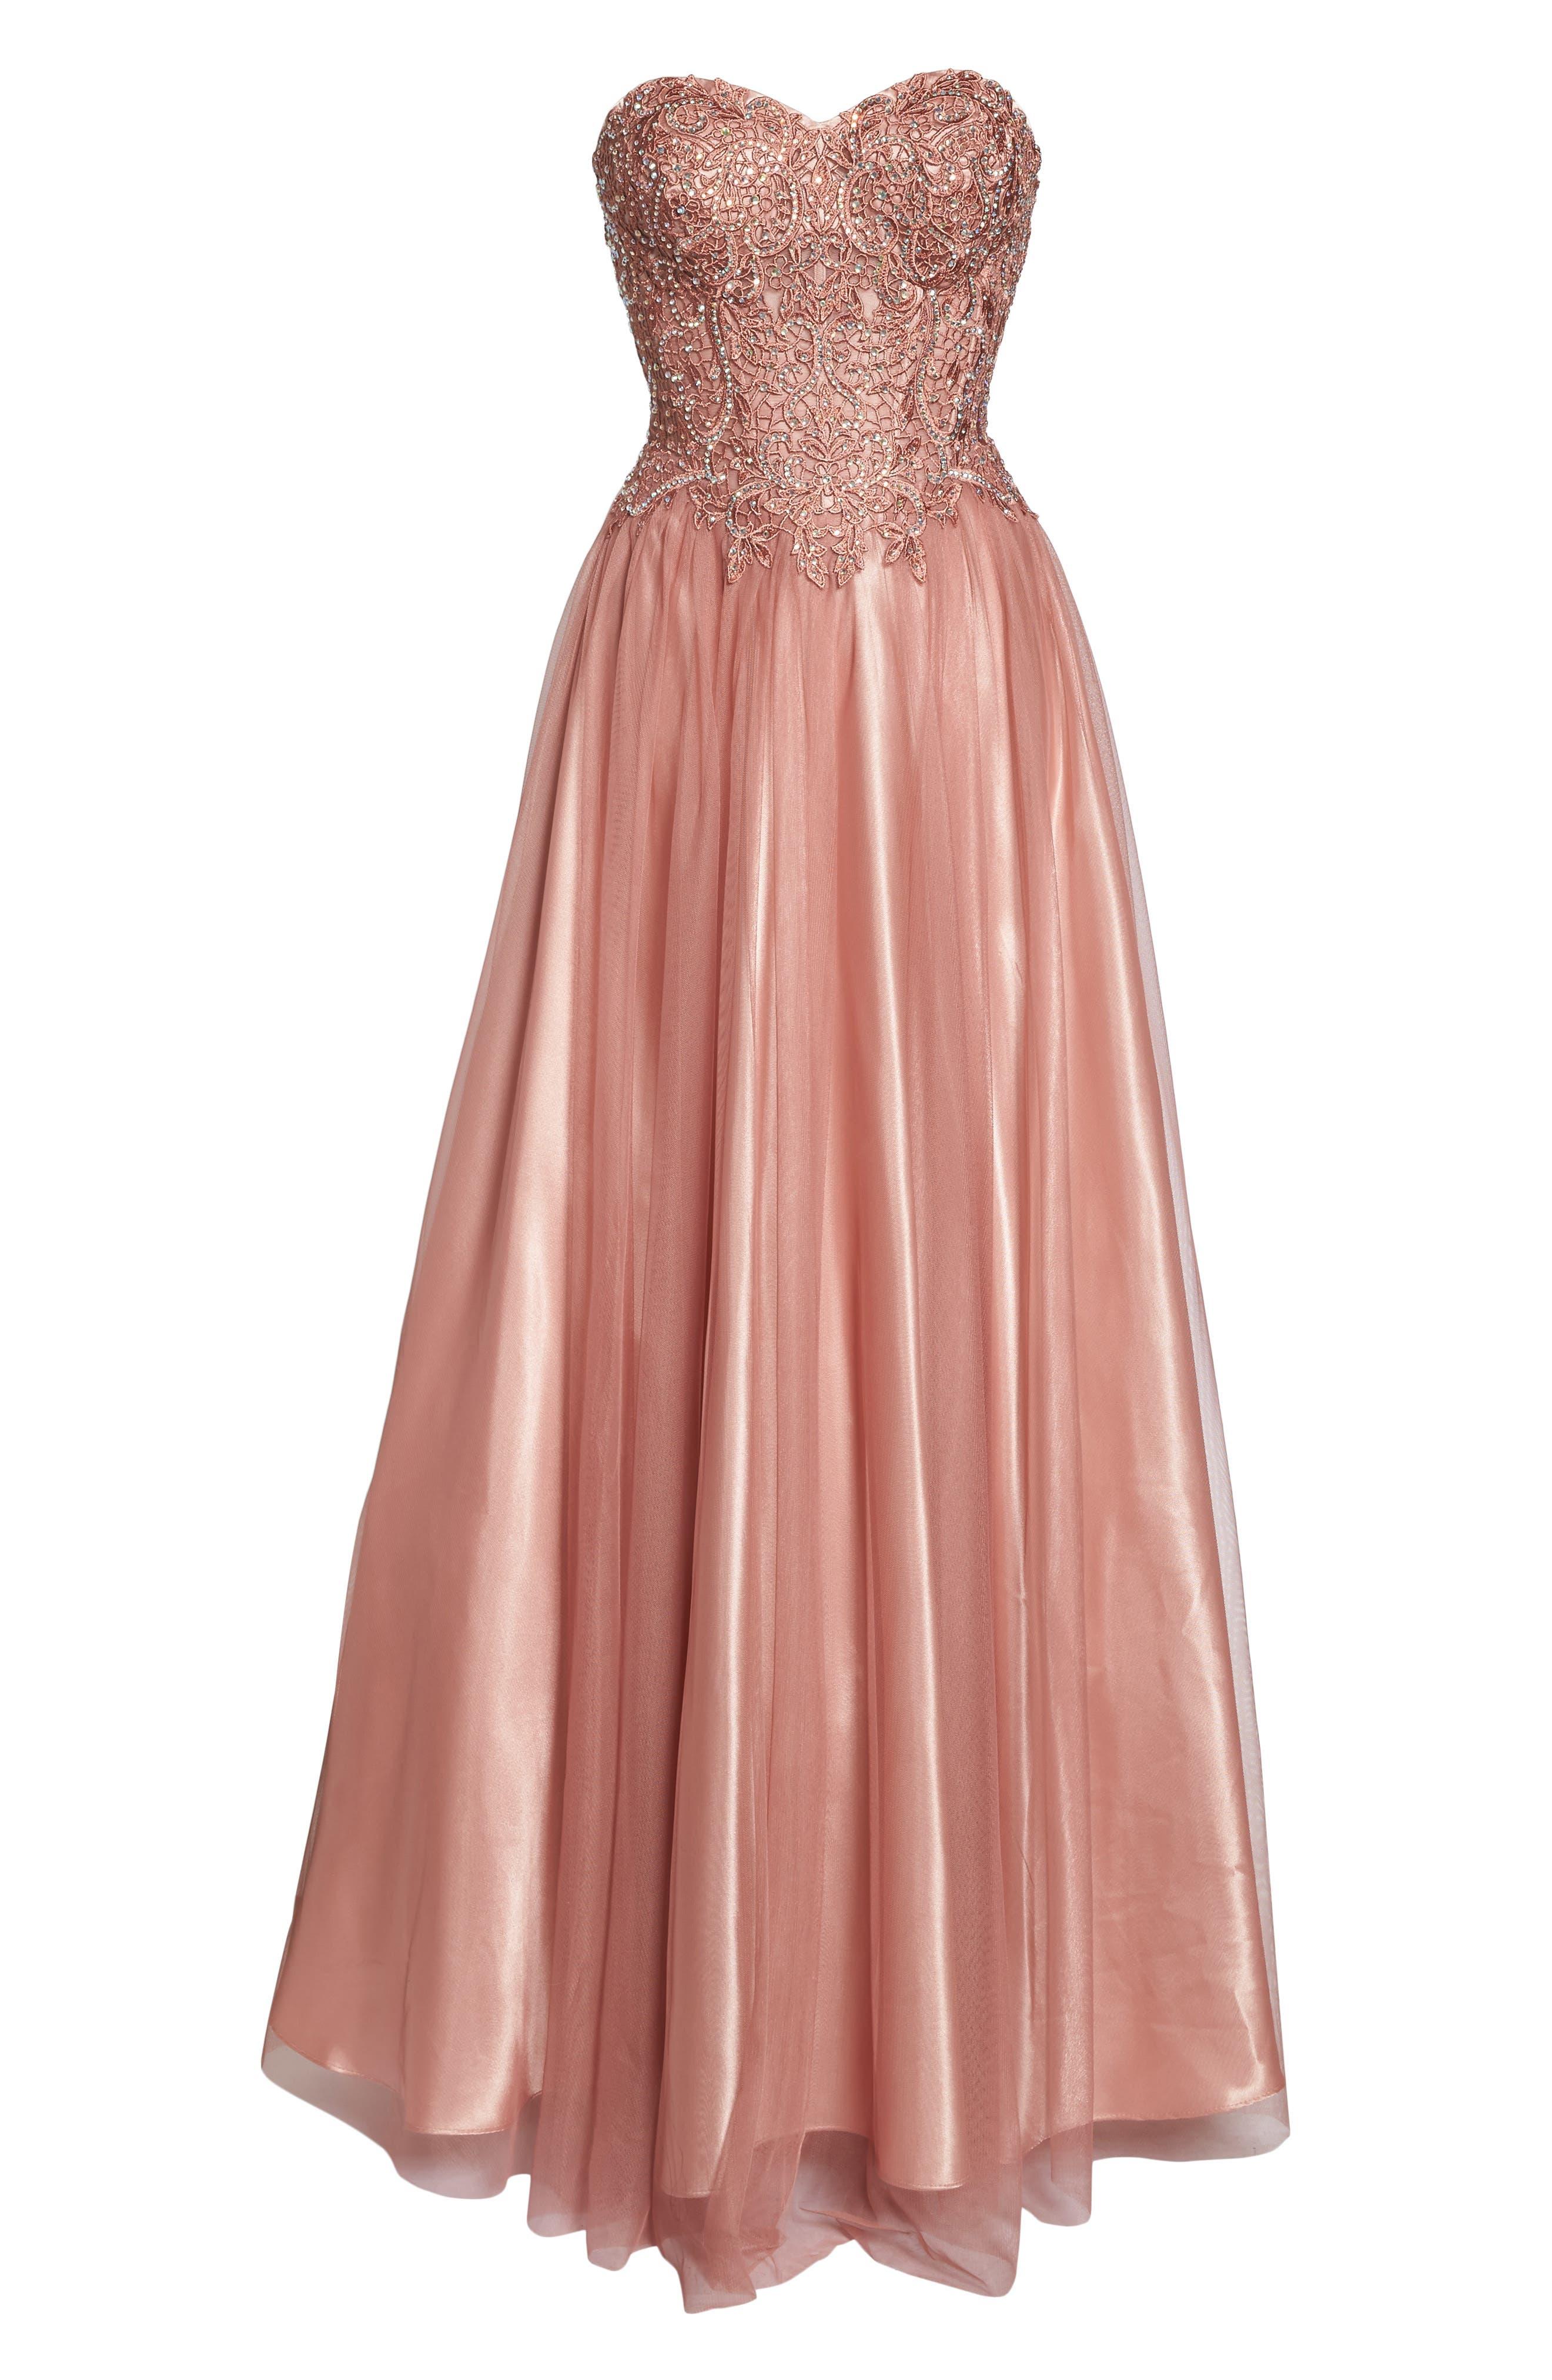 Embellished Corset Ballgown,                             Alternate thumbnail 6, color,                             654